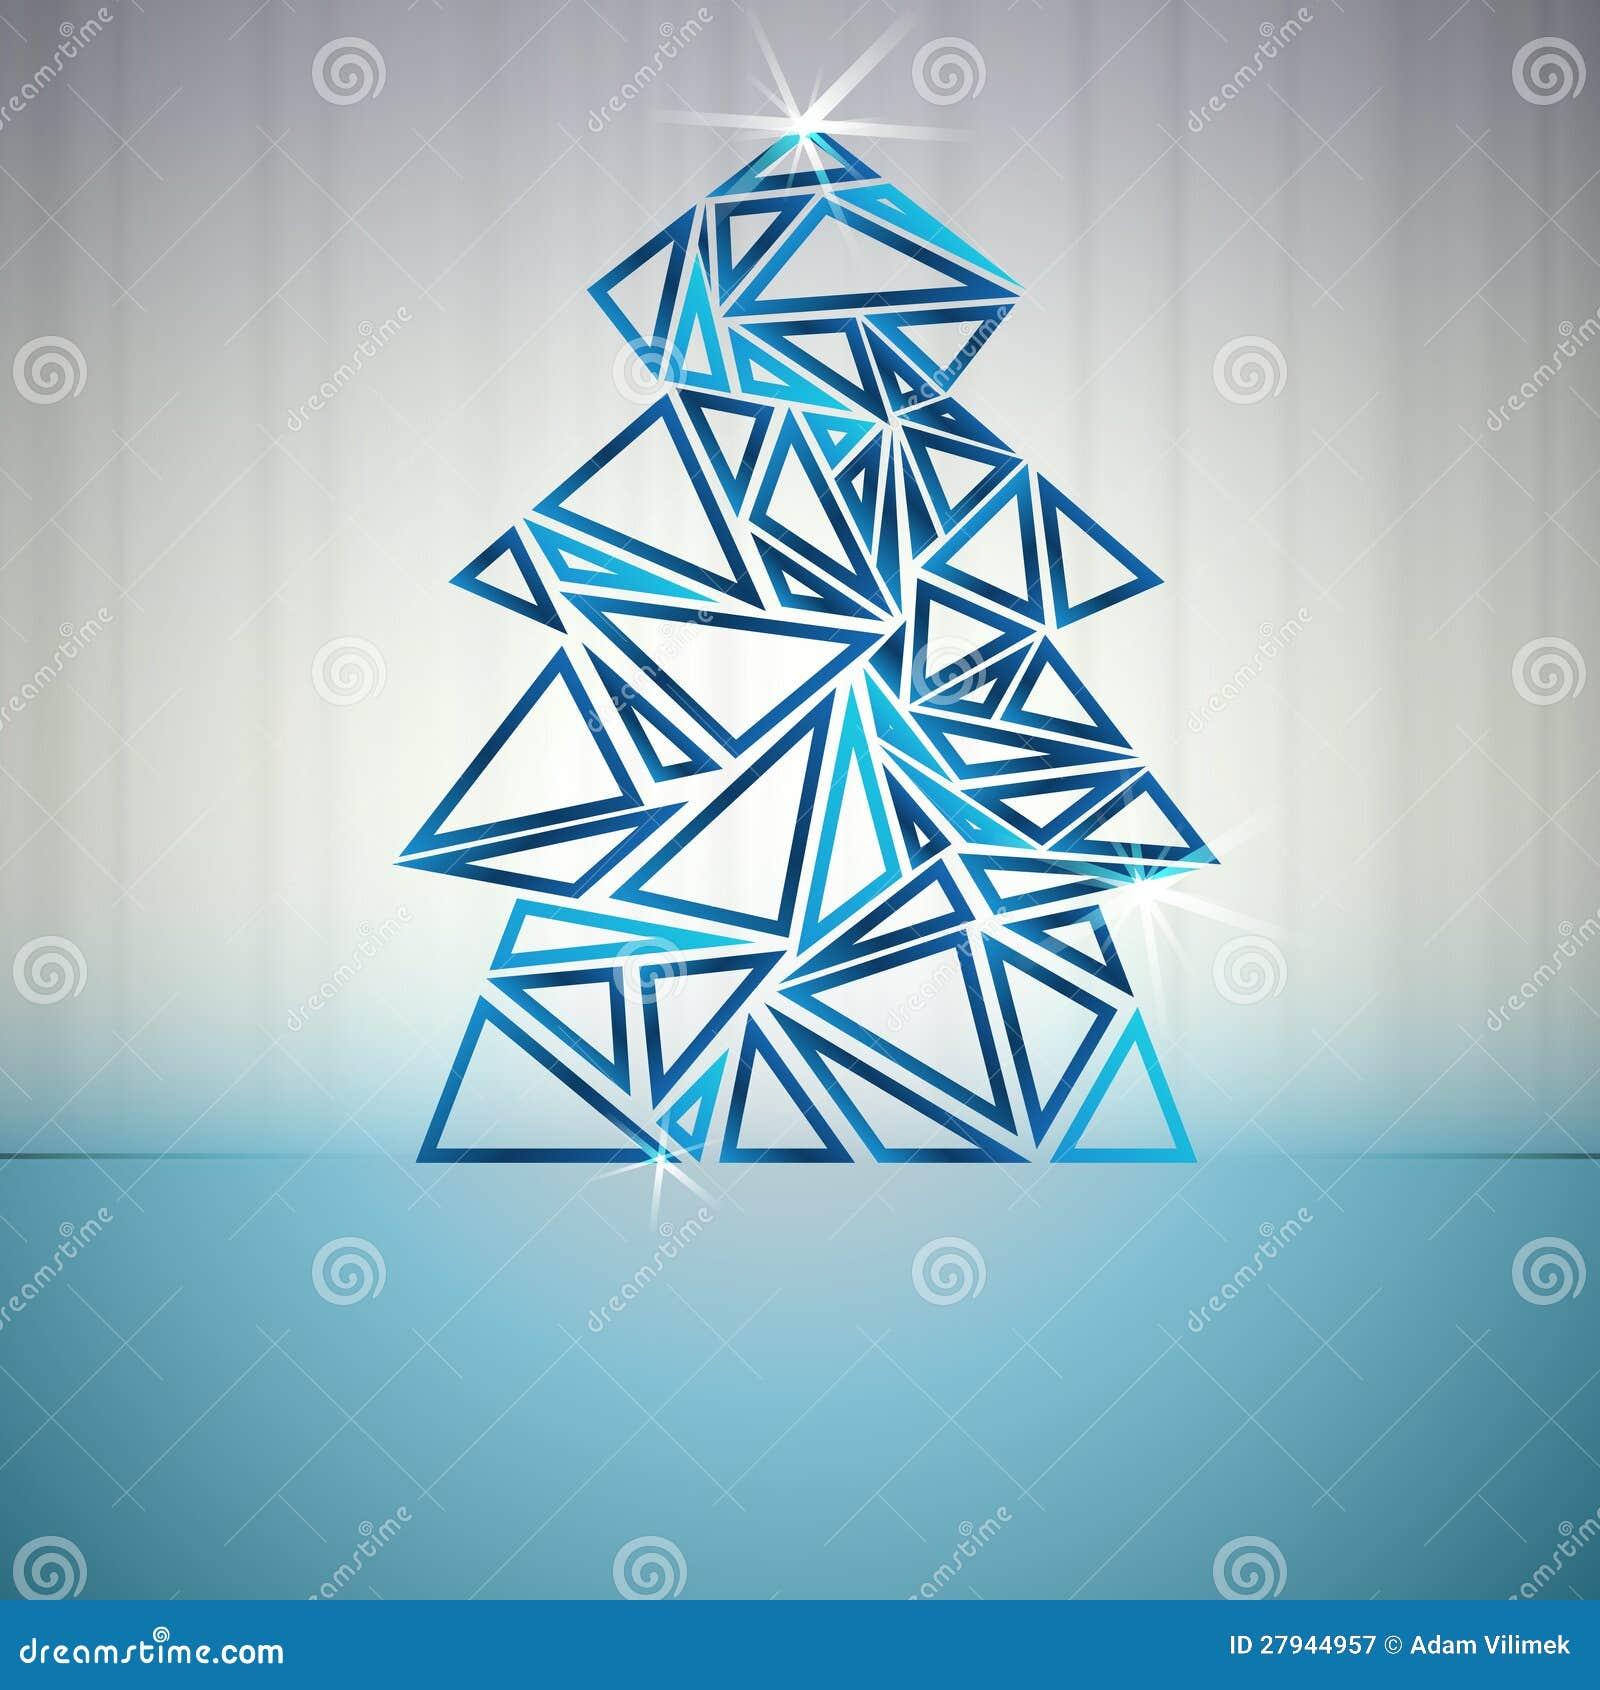 Simple Christmas Tree Outline